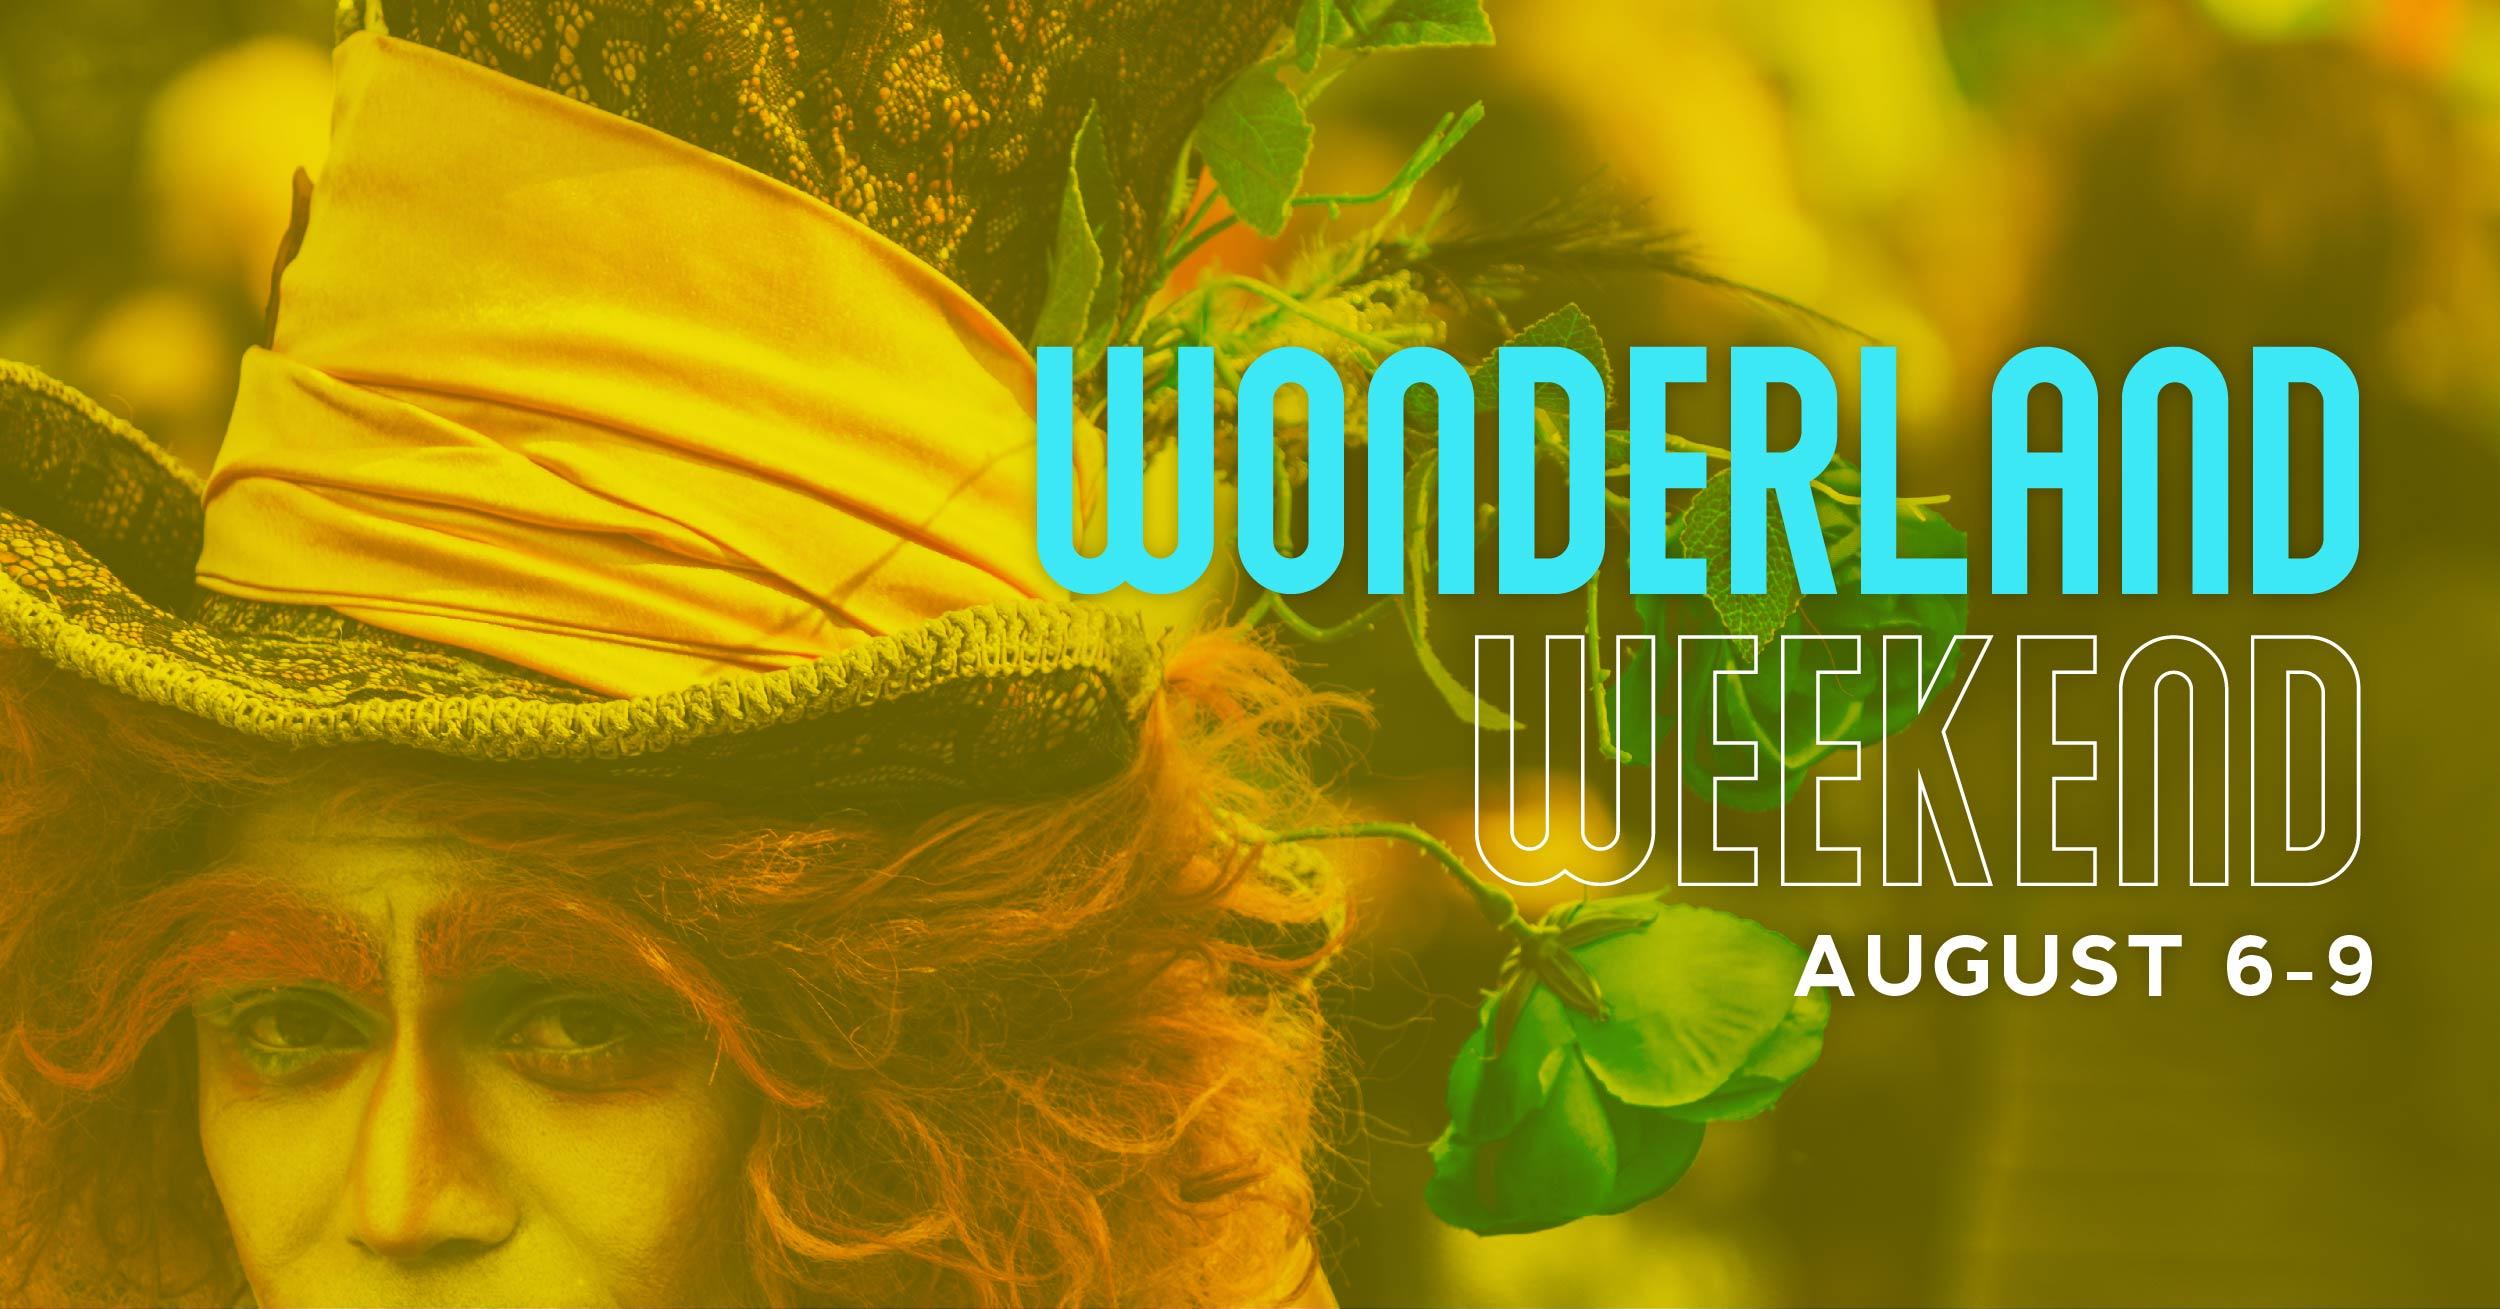 Wonderland Weekend at the Dunes promotional flyer